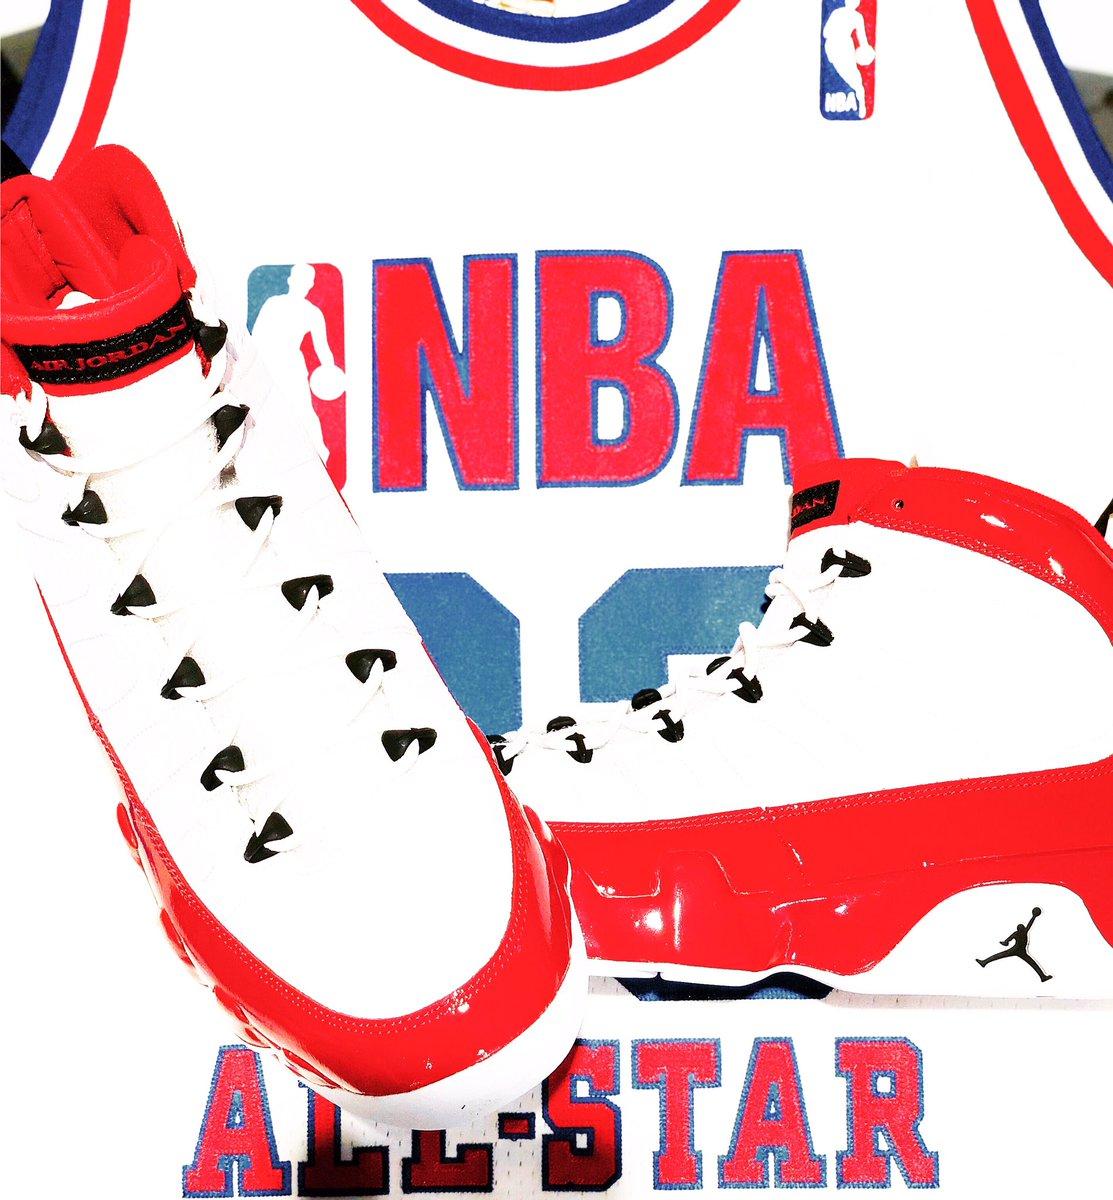 Jordan 9 retro white gym red release Saturday, October 5th @NBASTORE NYC